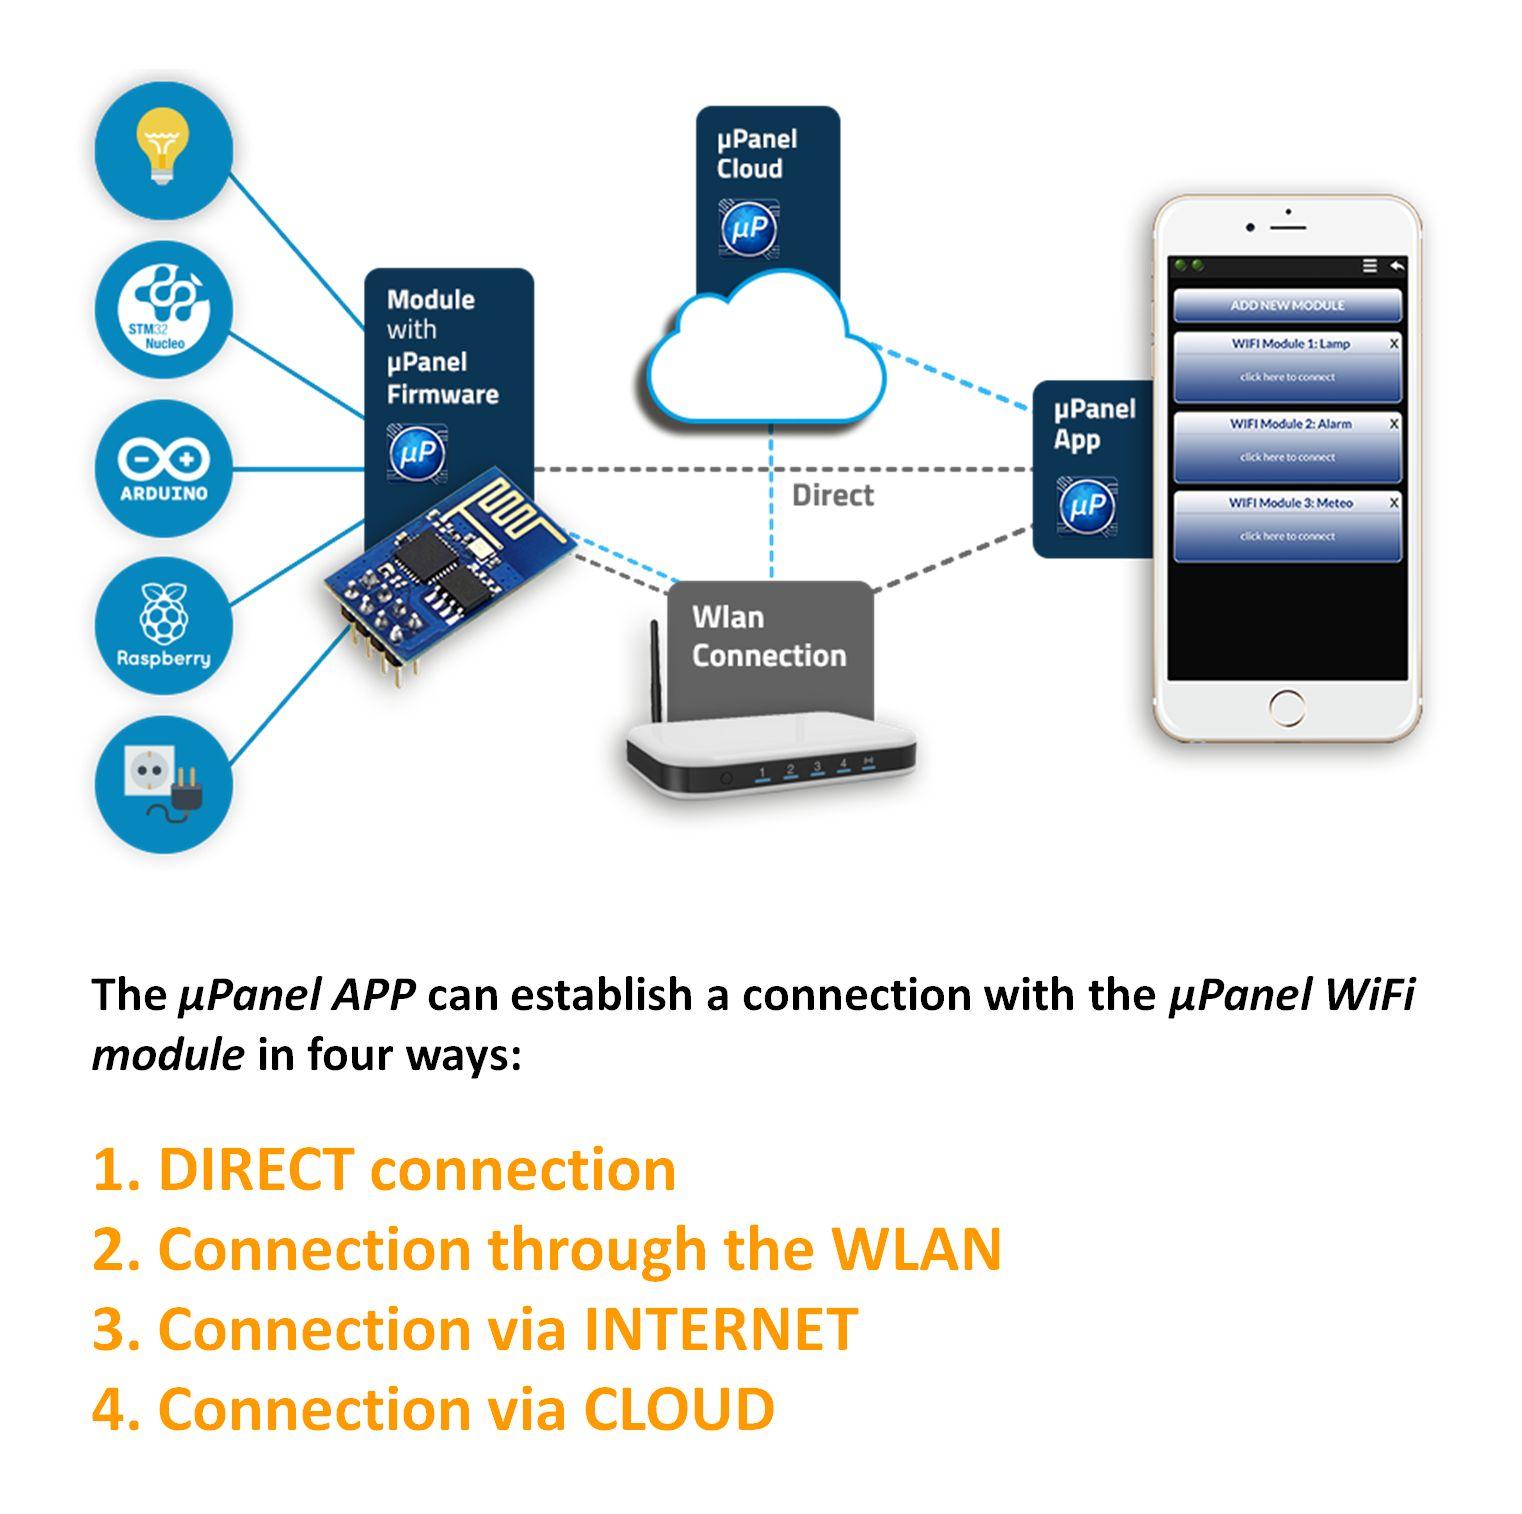 KIT-2-miuPanel-Controllo-Remoto-ESP8266-WiFi-Free-IoT-APP-for-Android-iOS-IoT miniatura 6